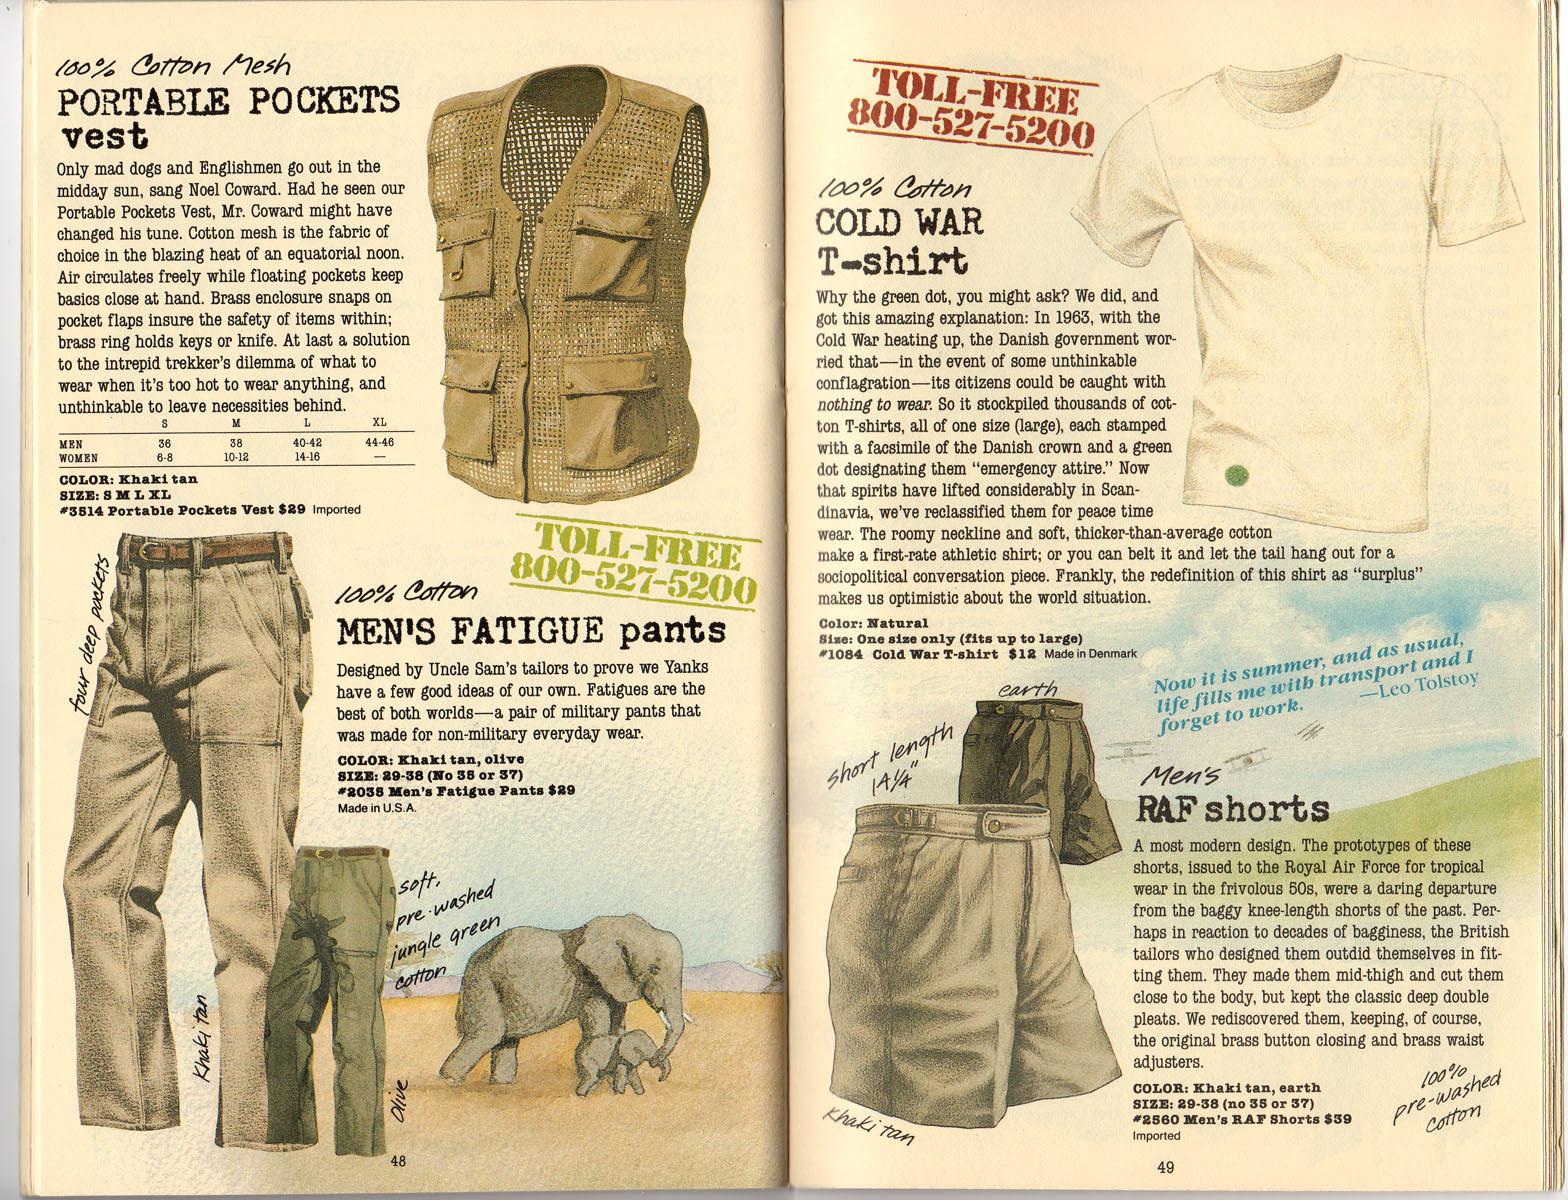 Banana Republic Summer 1985 Update #24 Portable Pockets Vest, Fatigue Pants, Cold Wat T-shirt, RAF Shorts